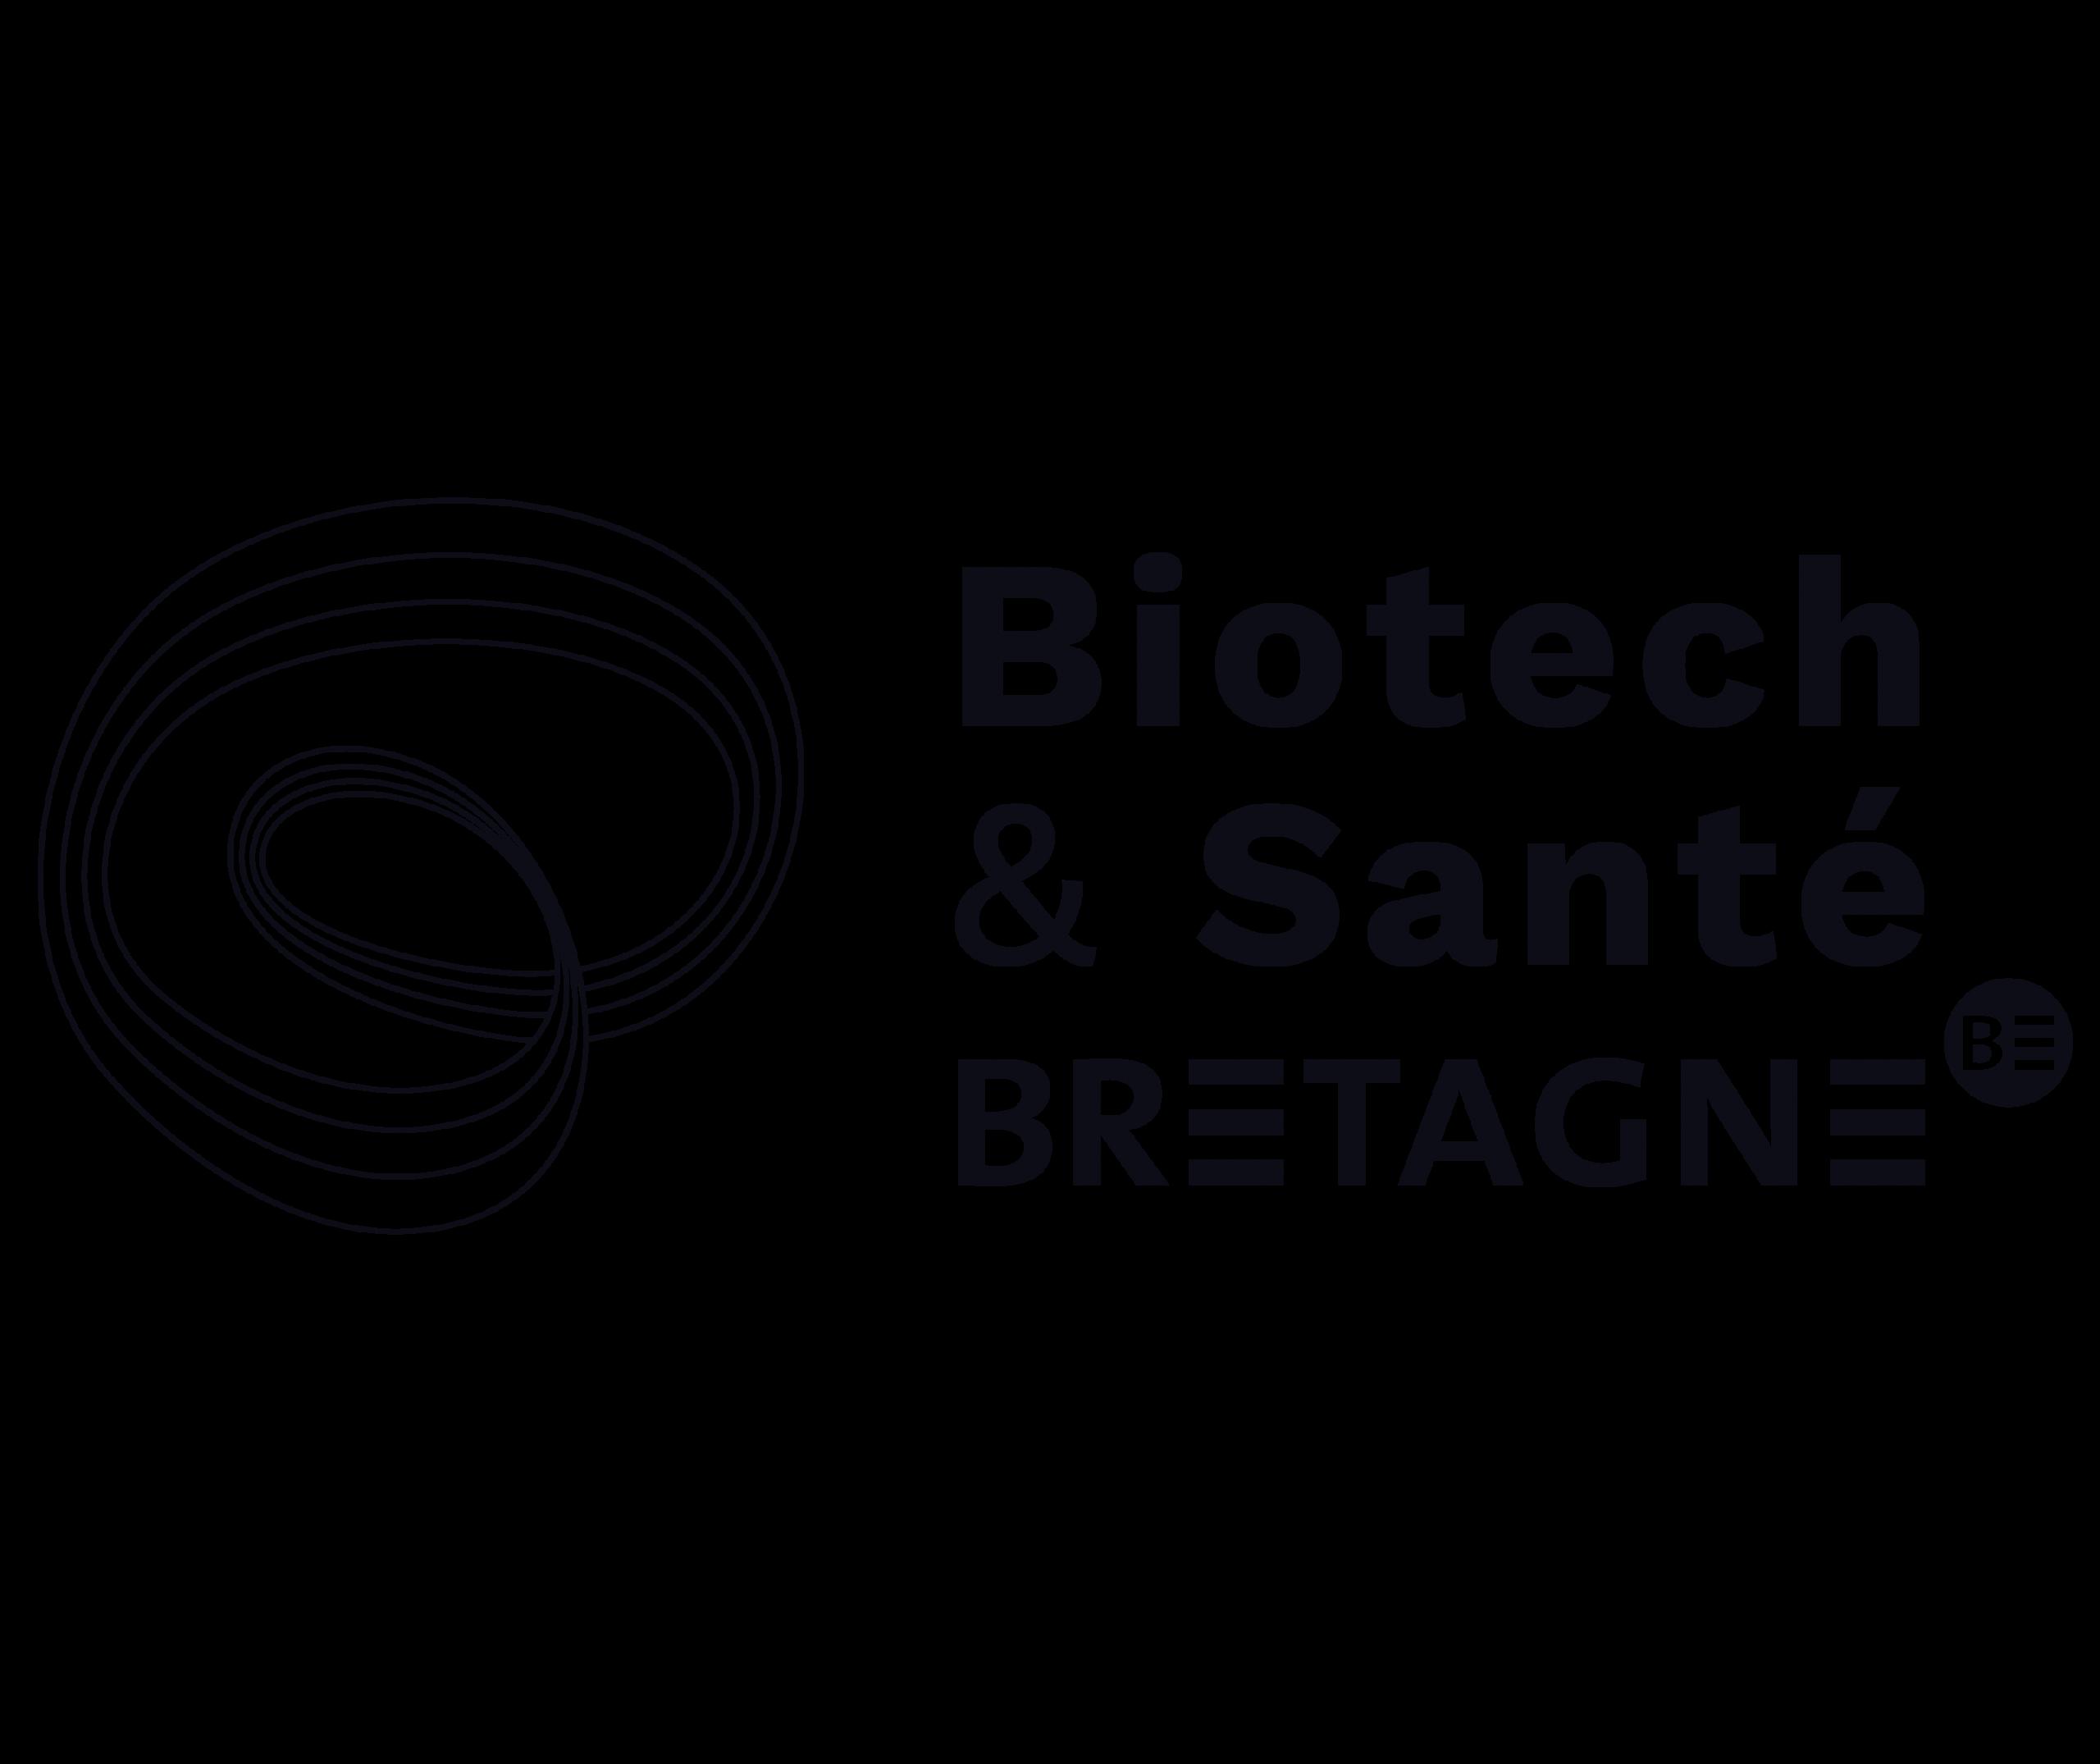 Logo Biotech et santé bretagne